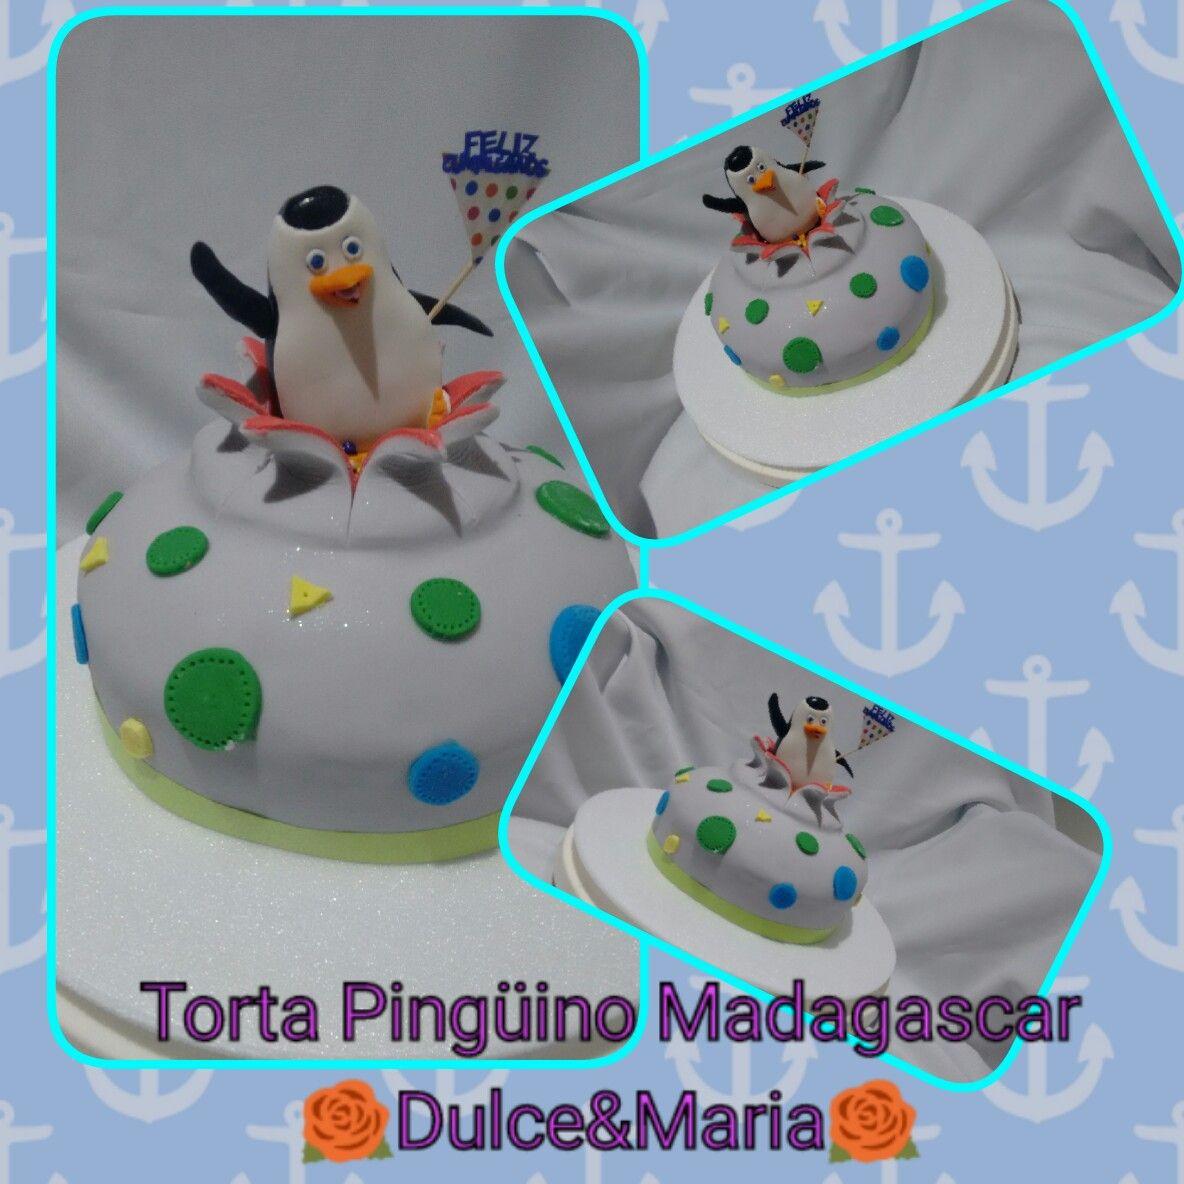 Torta Pingüino Madagascar 🌹Dulce&Maria🌹